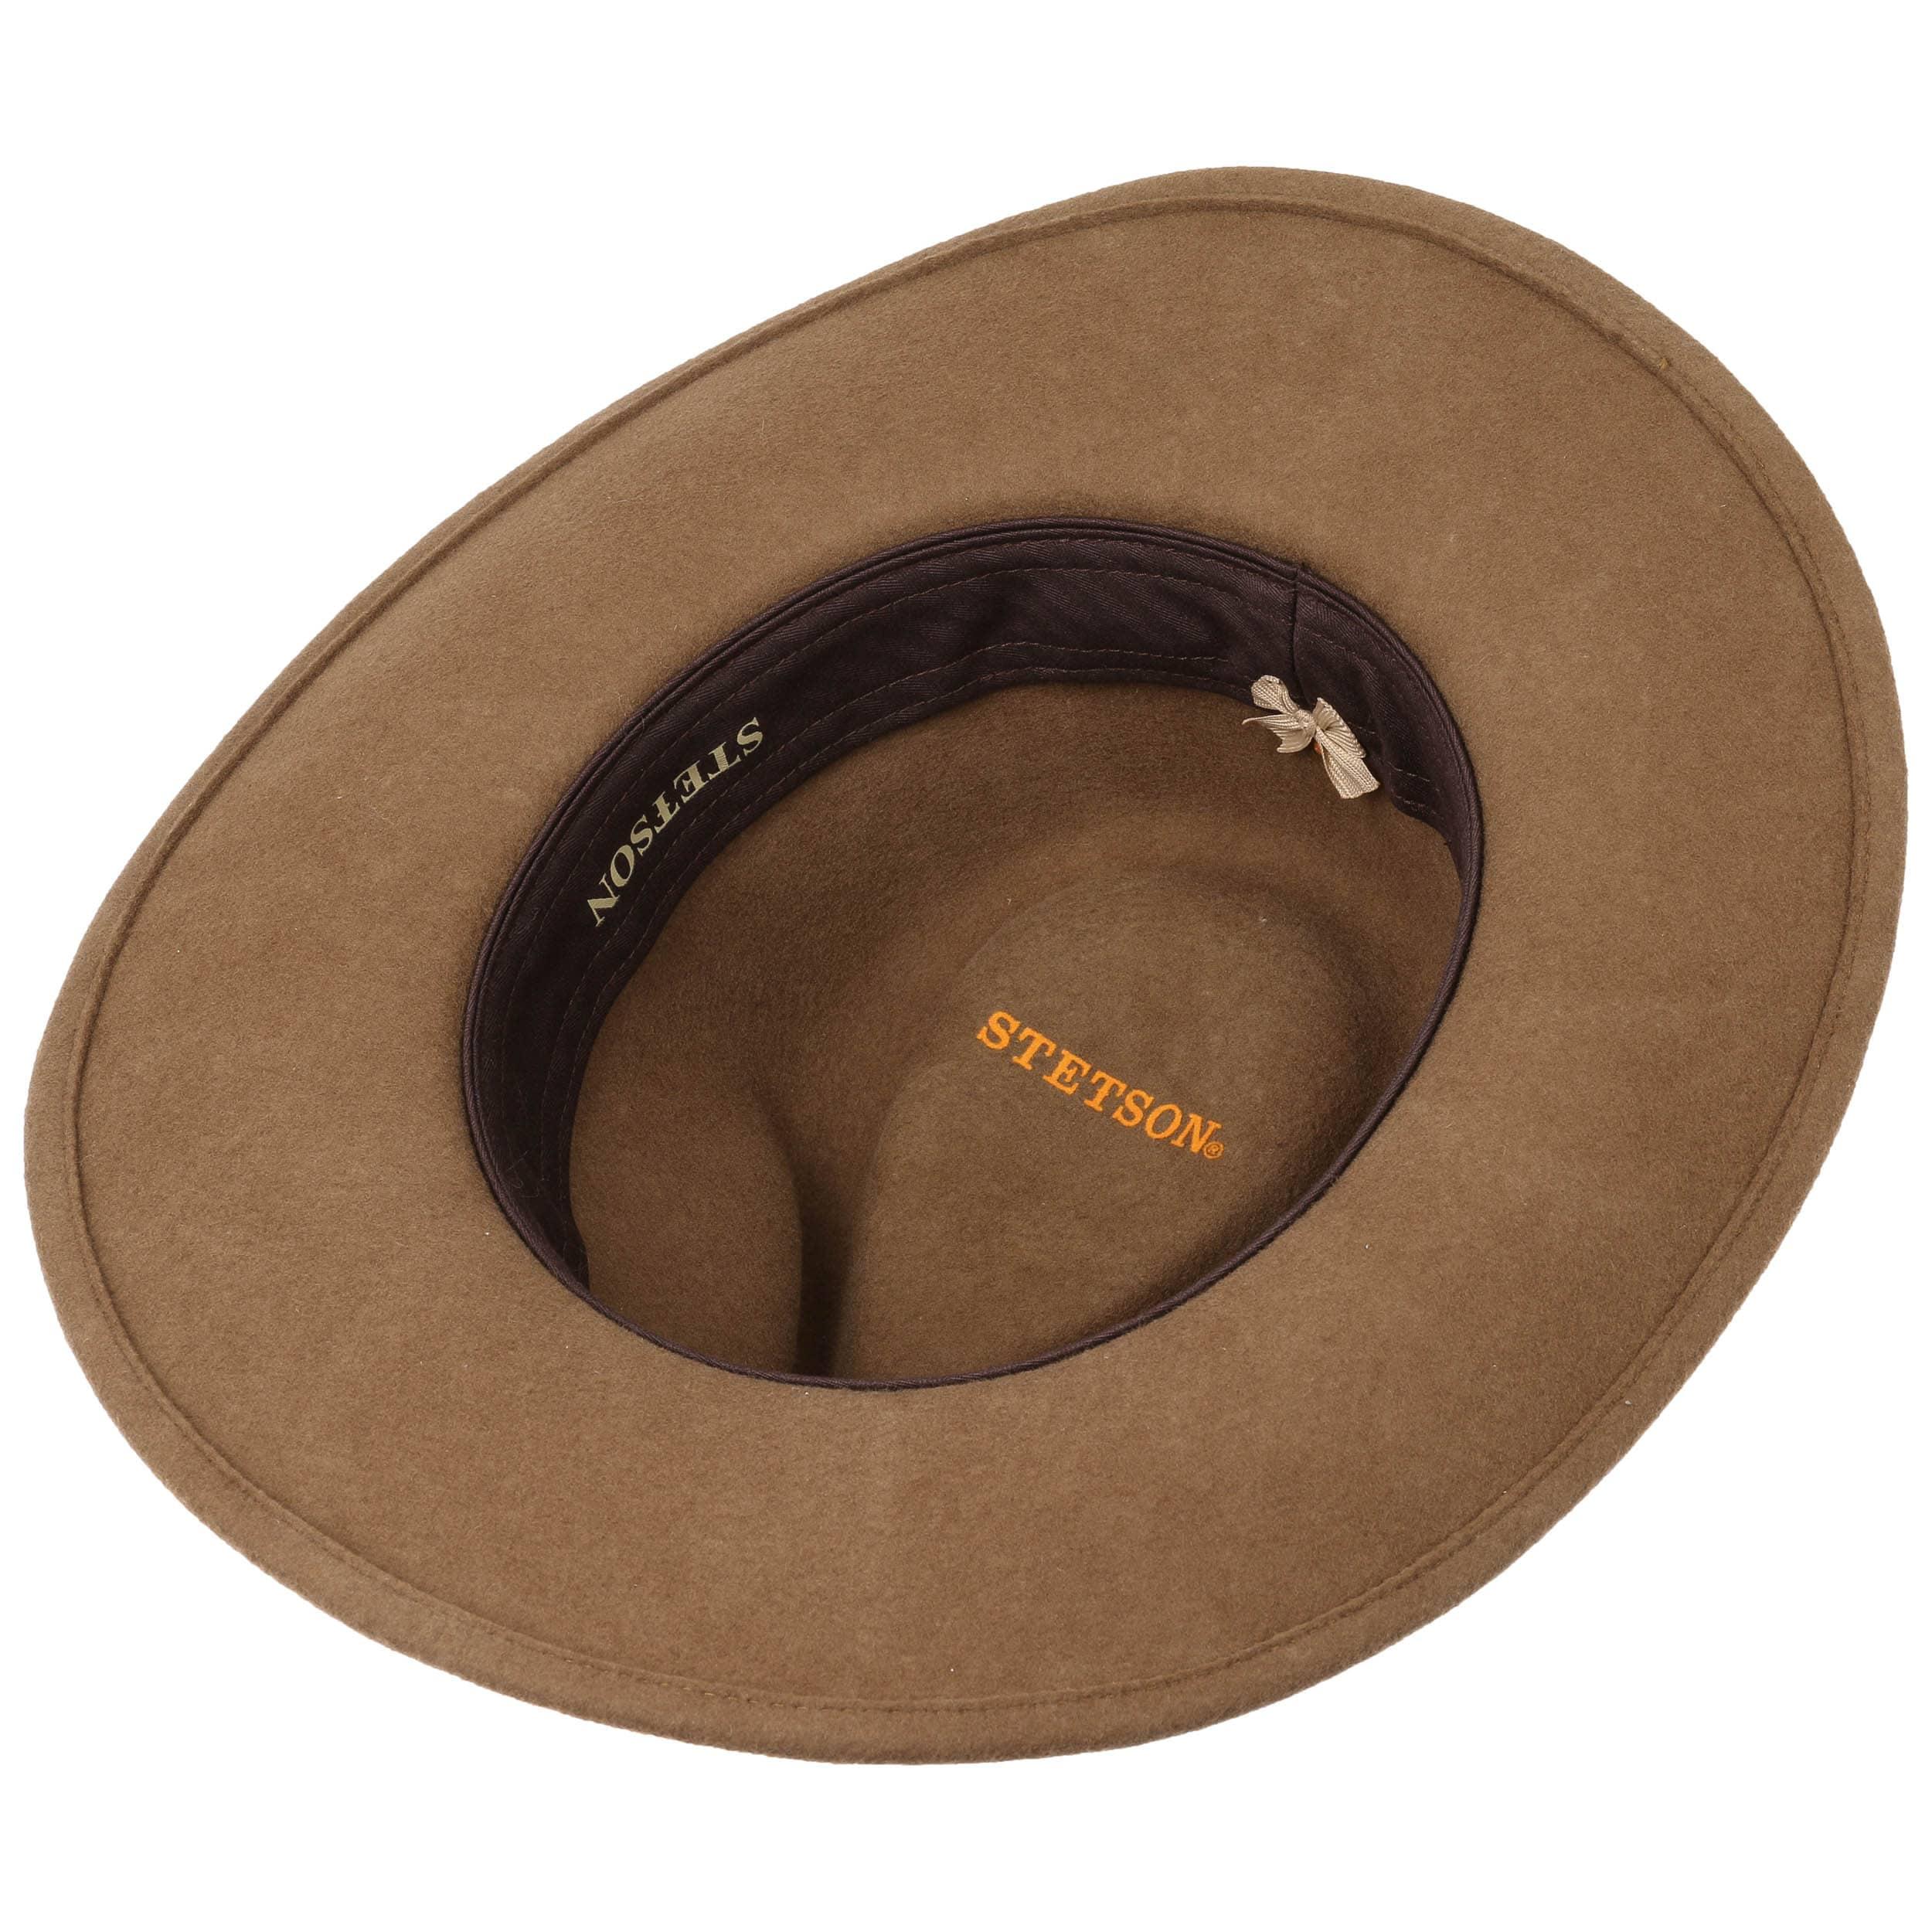 ... Powland Cowboy Cappello by Stetson - marrone 2 ... 2d35ca3f9857